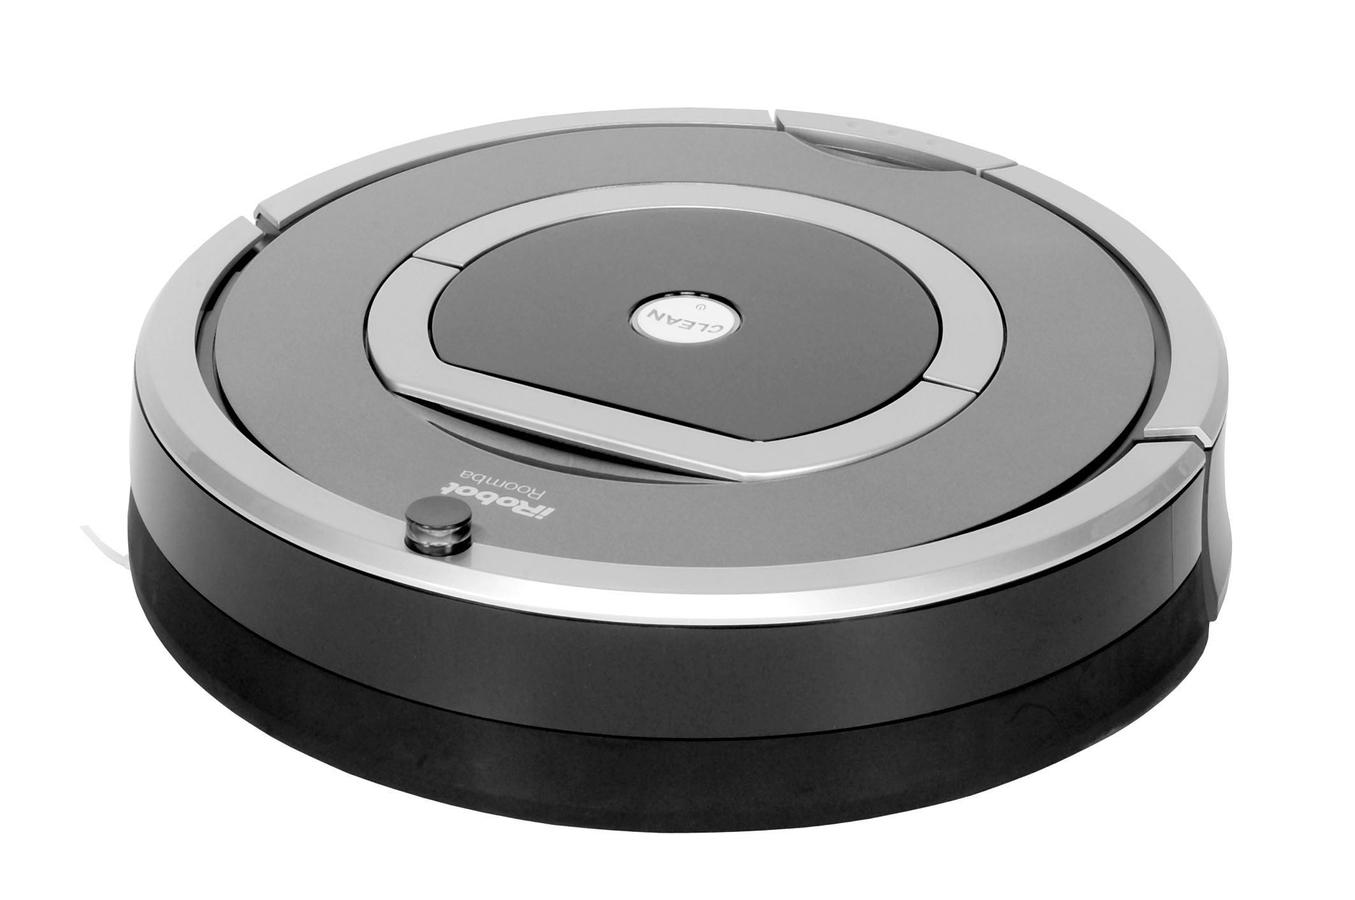 aspirateur robot irobot roomba780 kit ent 3810143 darty. Black Bedroom Furniture Sets. Home Design Ideas